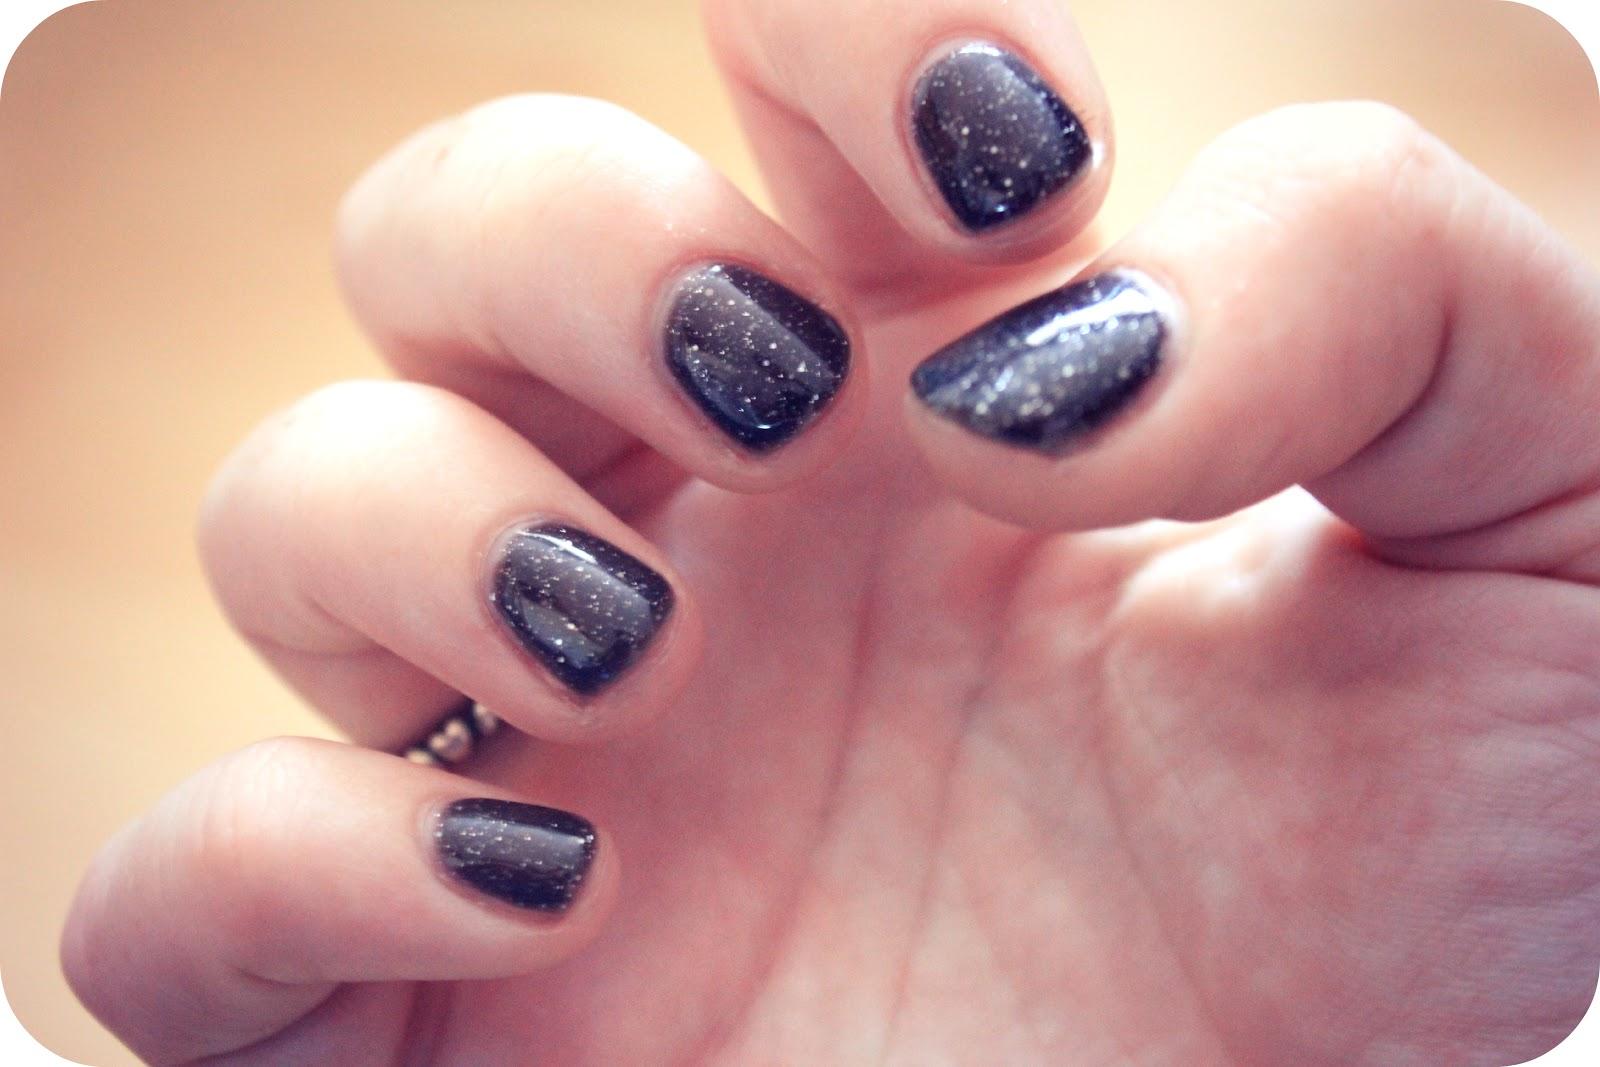 Gel Nails...Are They Worth It? | Brogan Tate